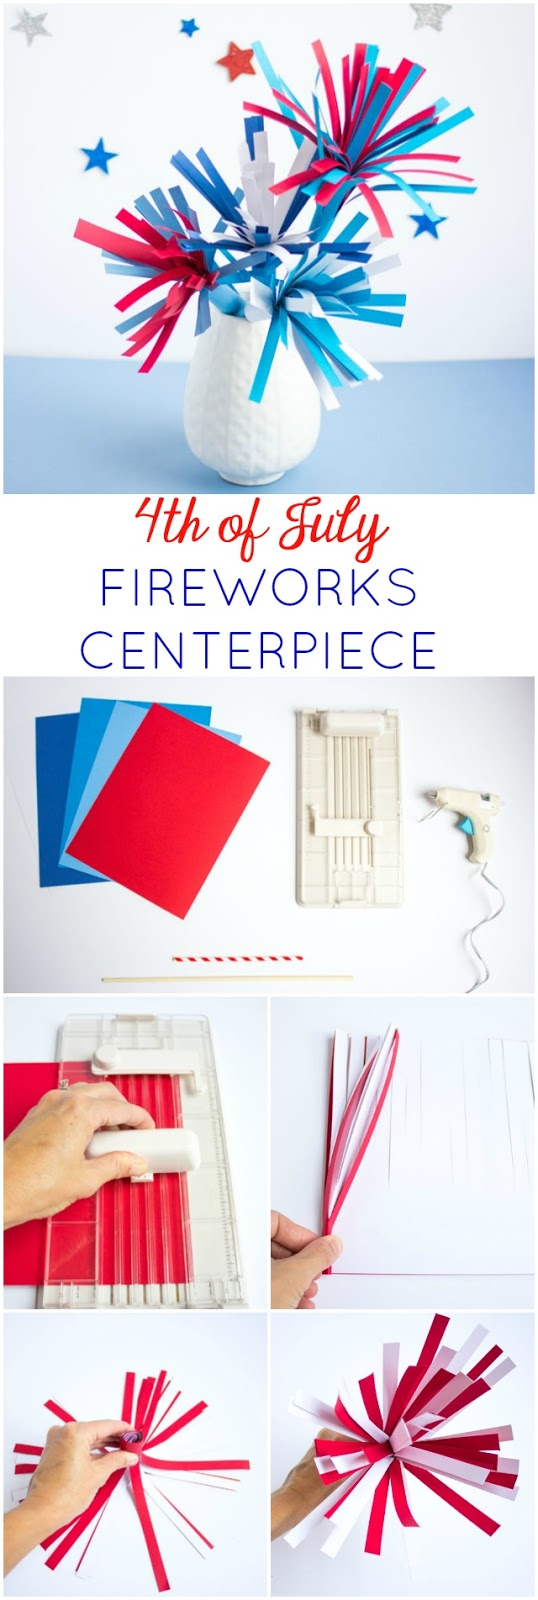 DIY Paper Fireworks Centerpiece - Design Improvised